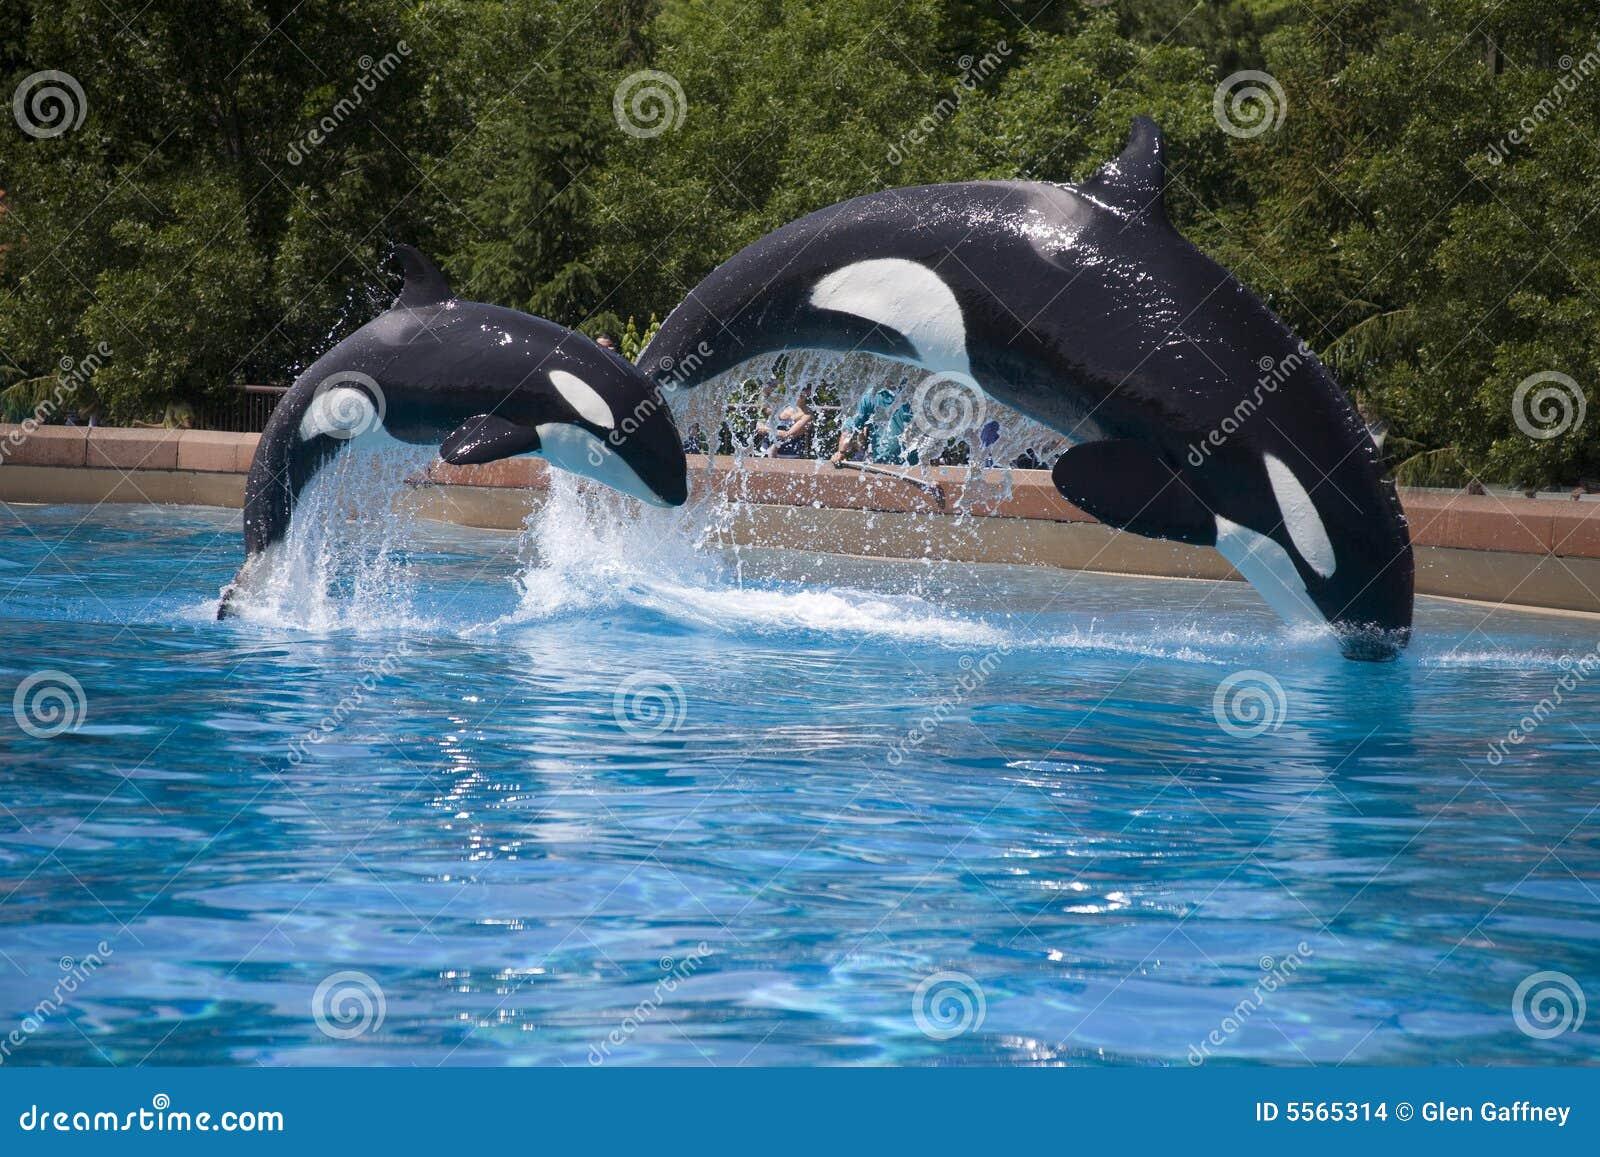 Breaching orca whales